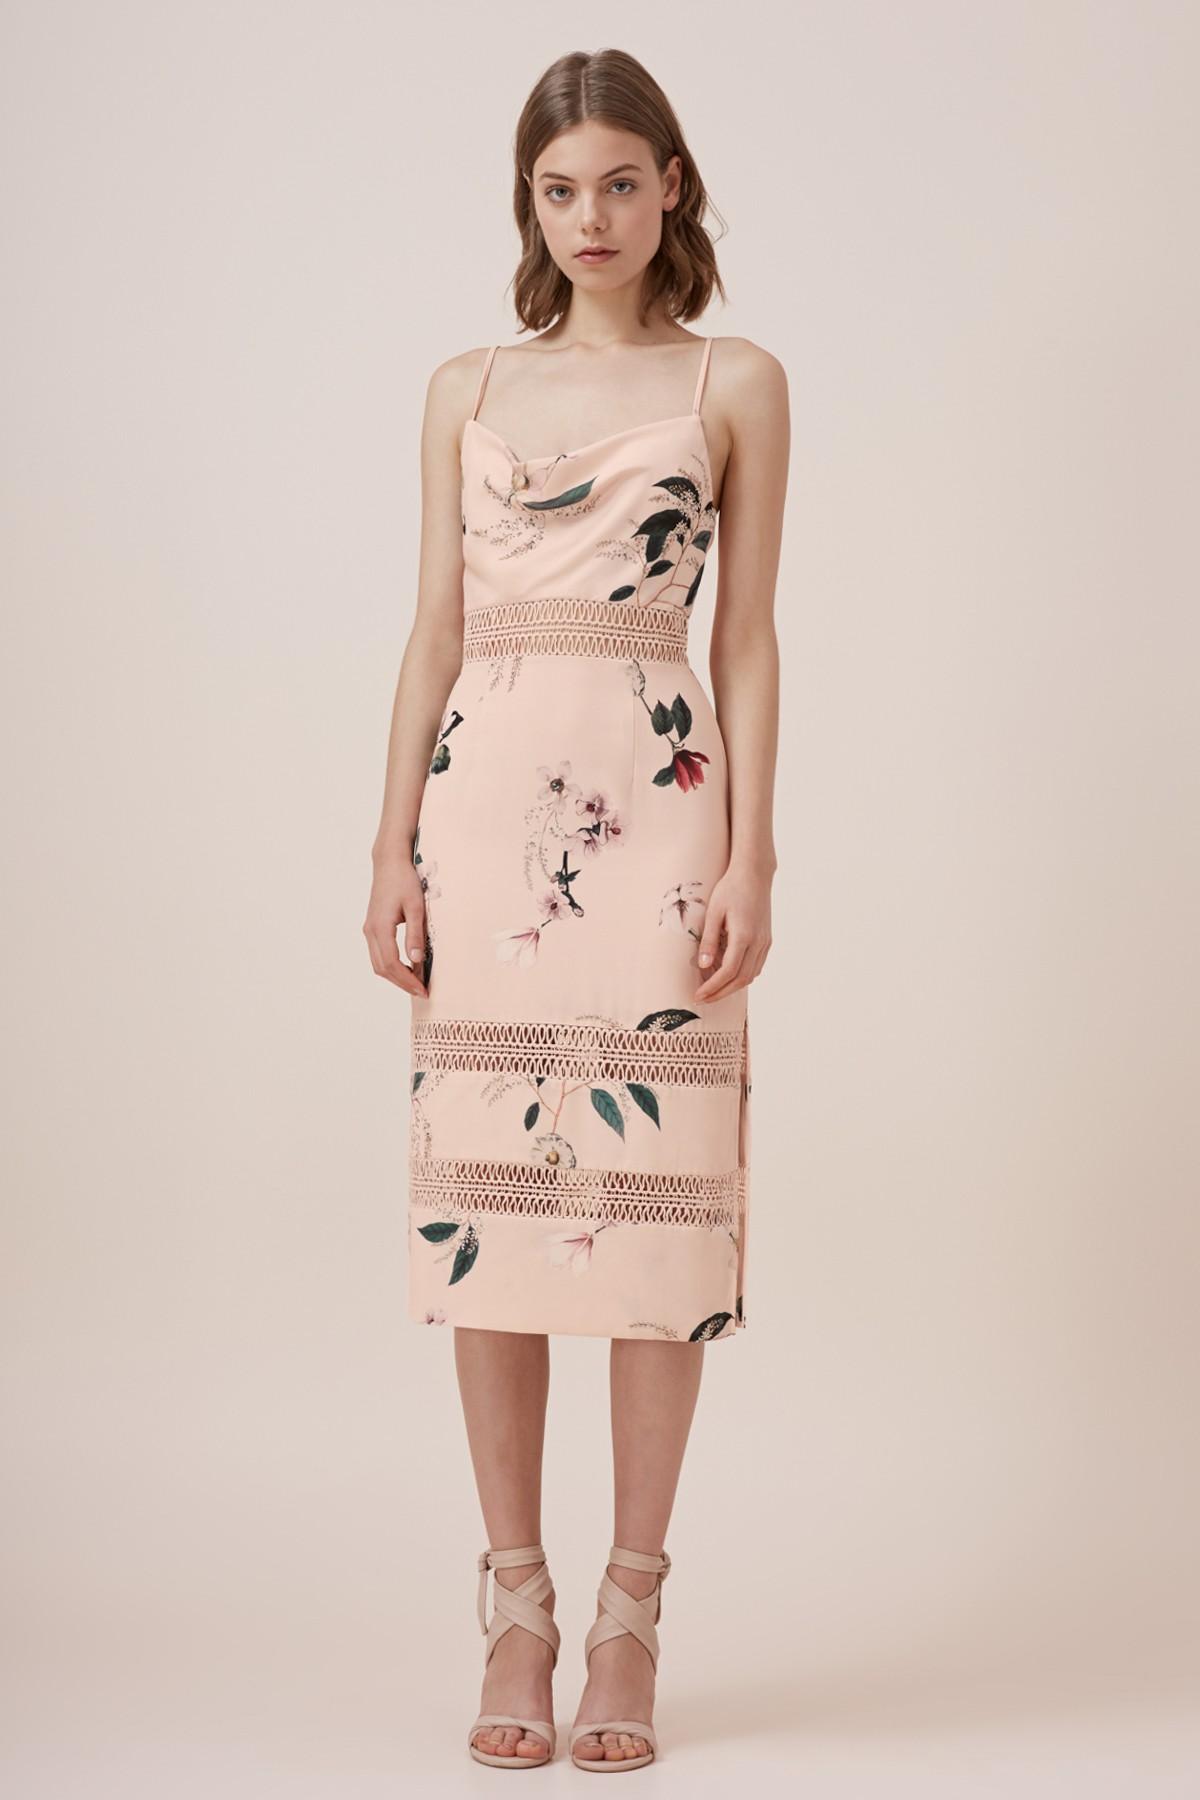 Keepsake The Label Do It Right Dress